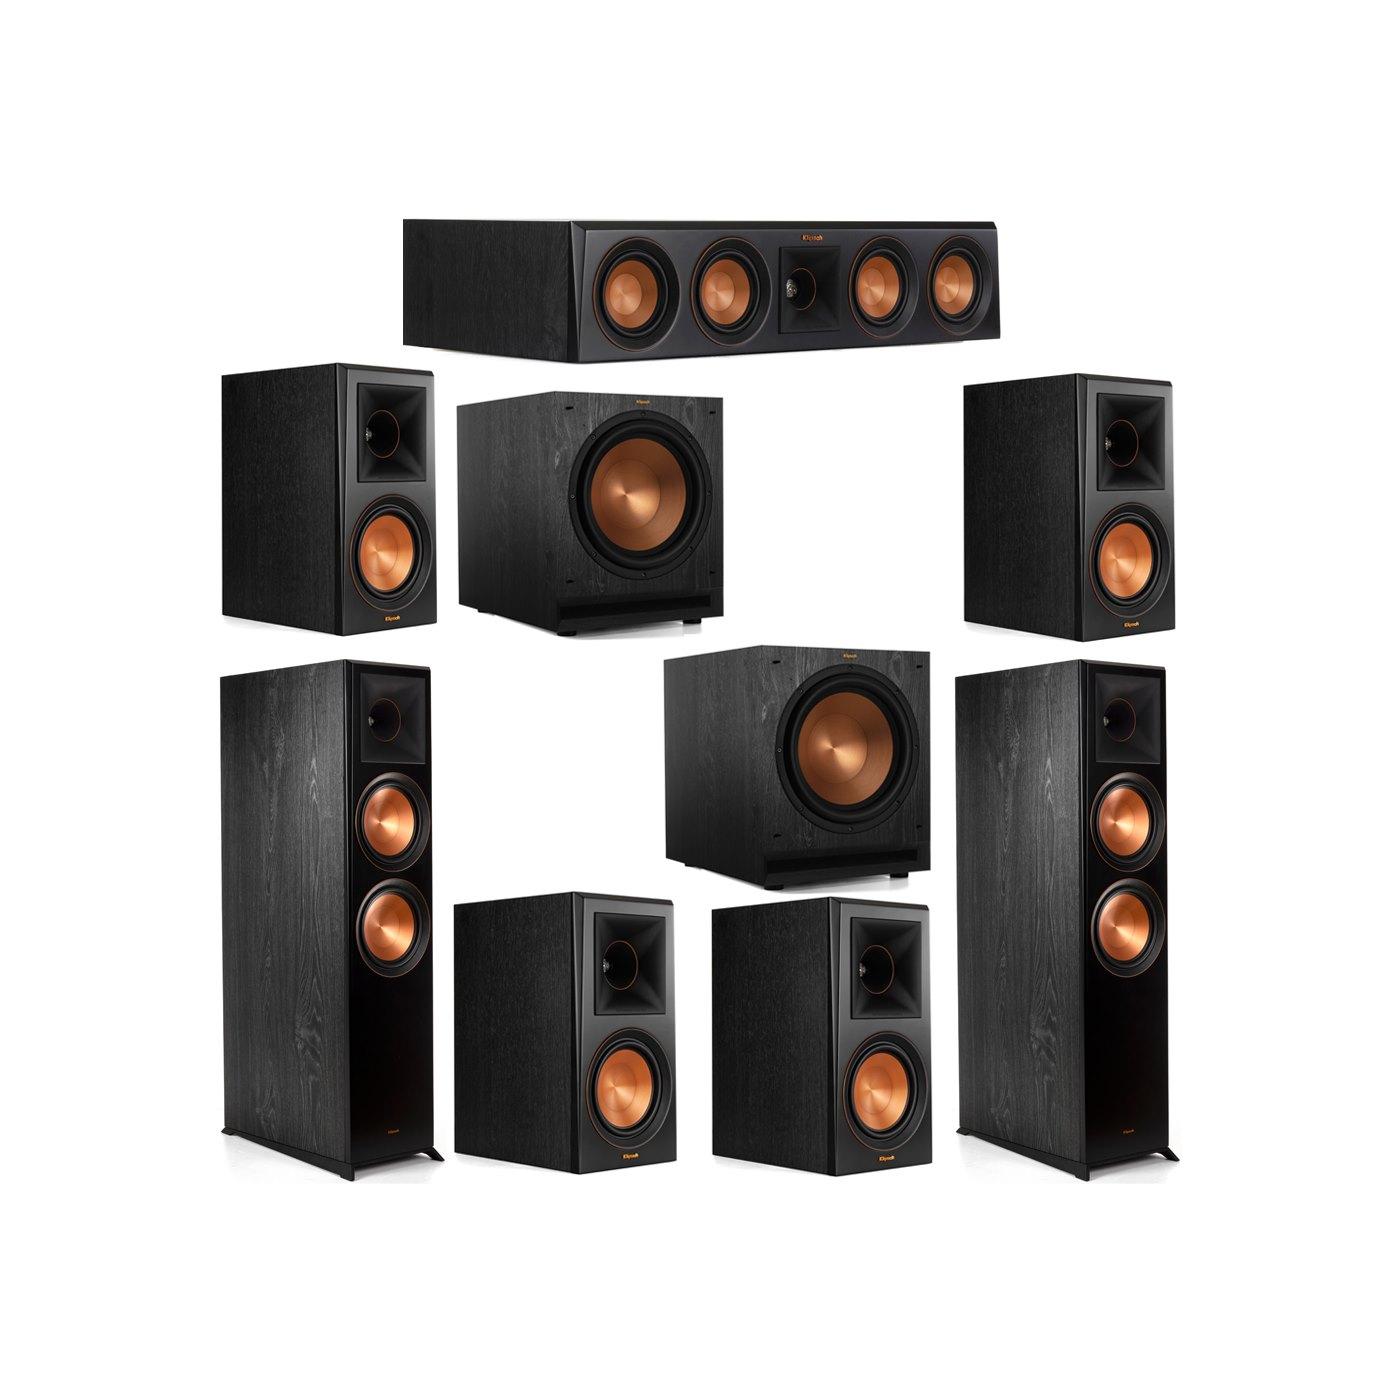 Klipsch 7.2 System with 2 RP-8000F Floorstanding Speakers, 1 Klipsch RP-404C Center Speaker, 4 Klipsch RP-600M Surround Speakers, 2 Klipsch SPL-120 Subwoofers